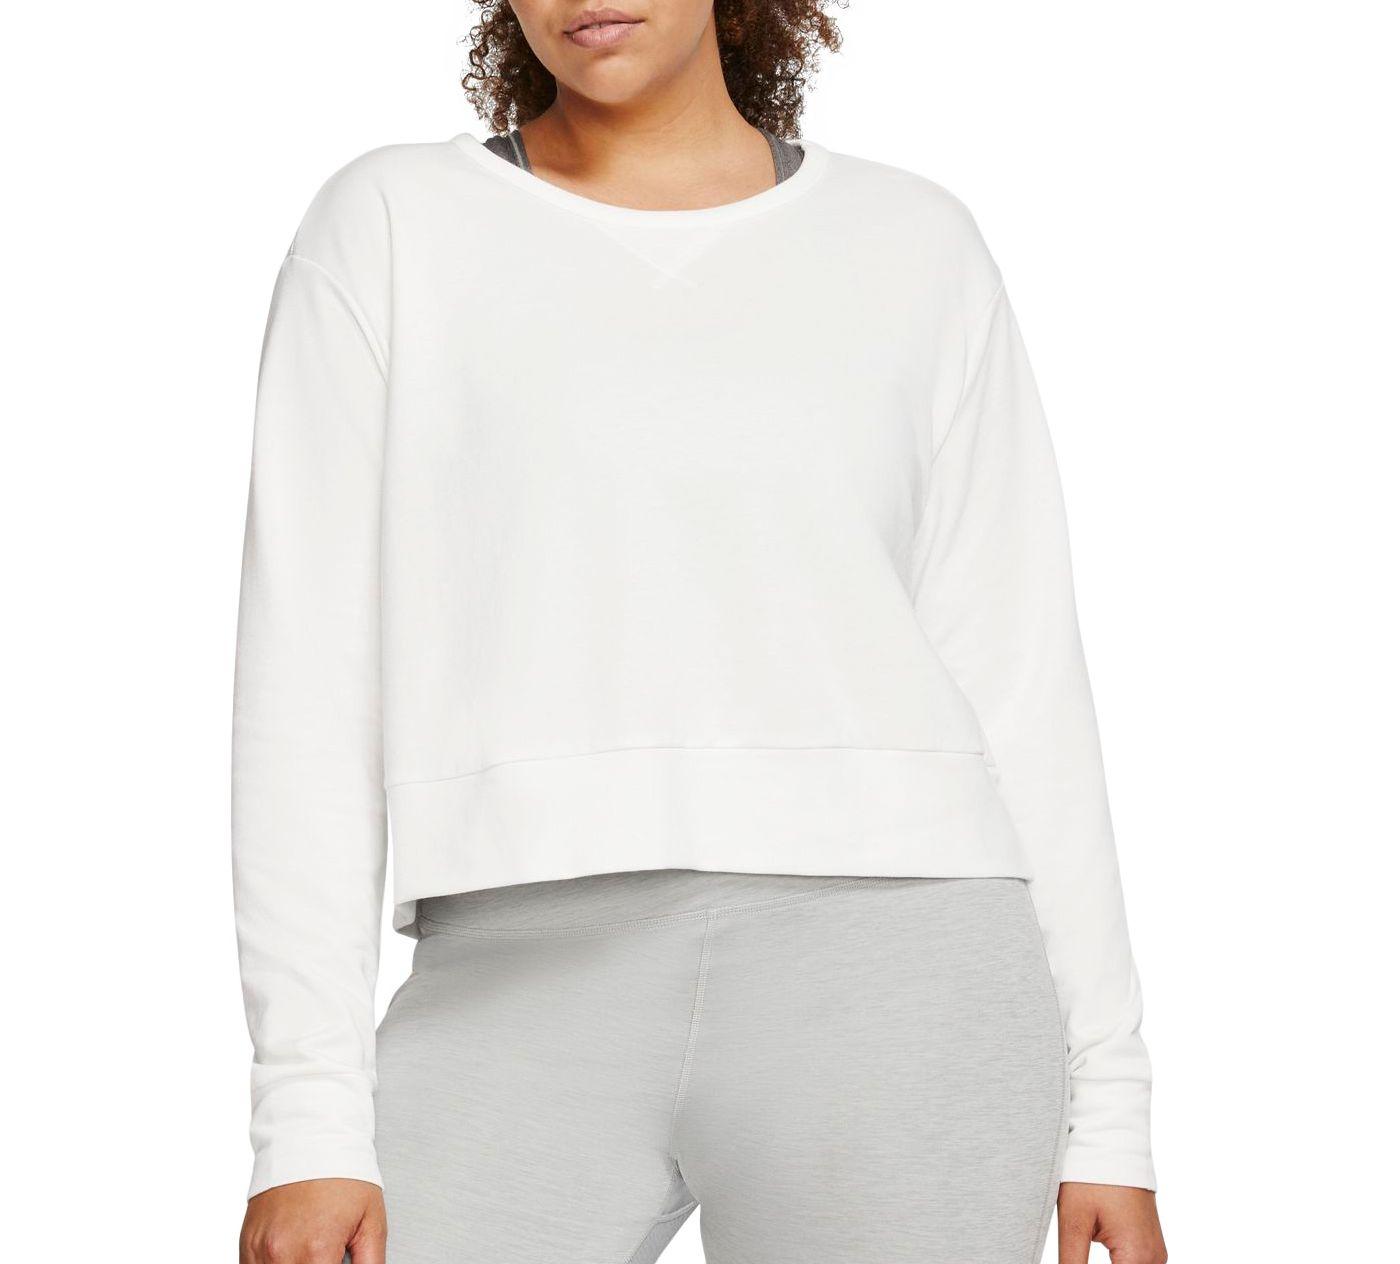 Nike Women's Plus Size Yoga Long Sleeve Open Back Training Top